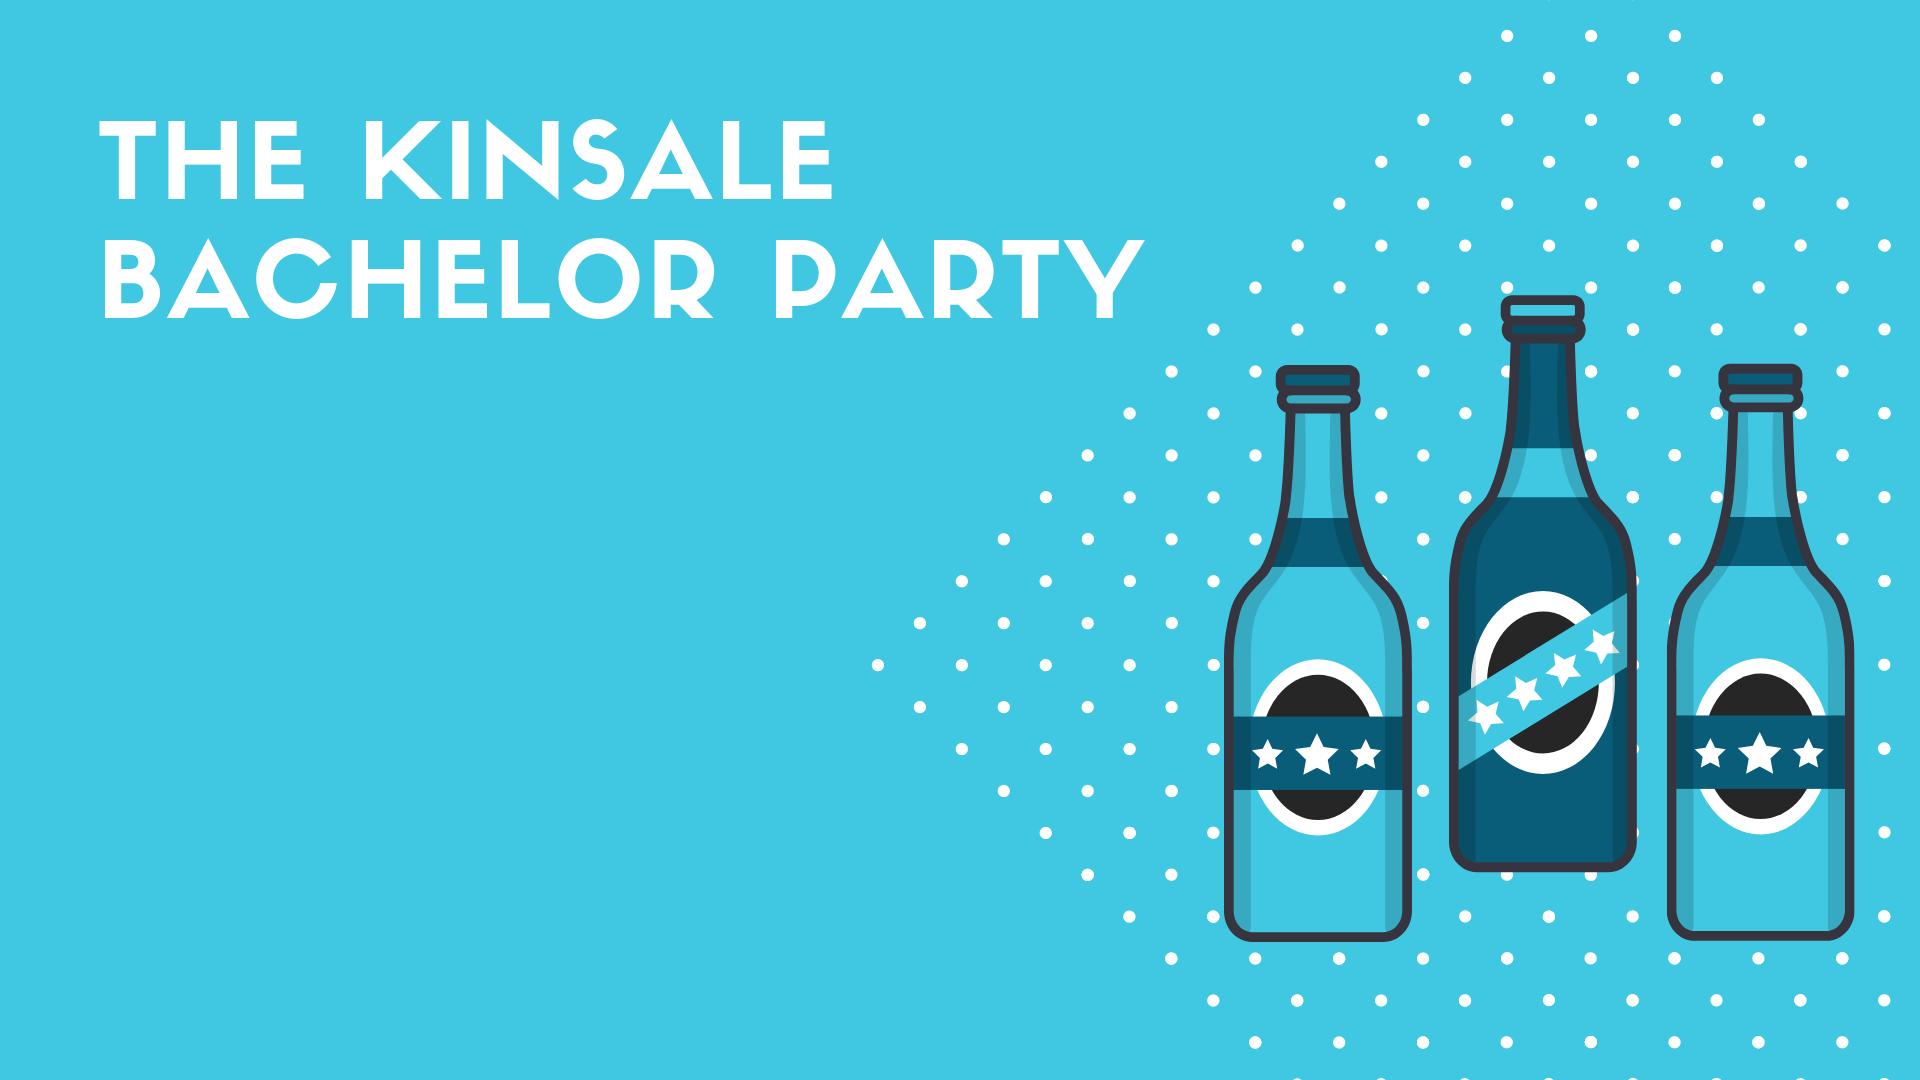 KINSALE bachelor party.png